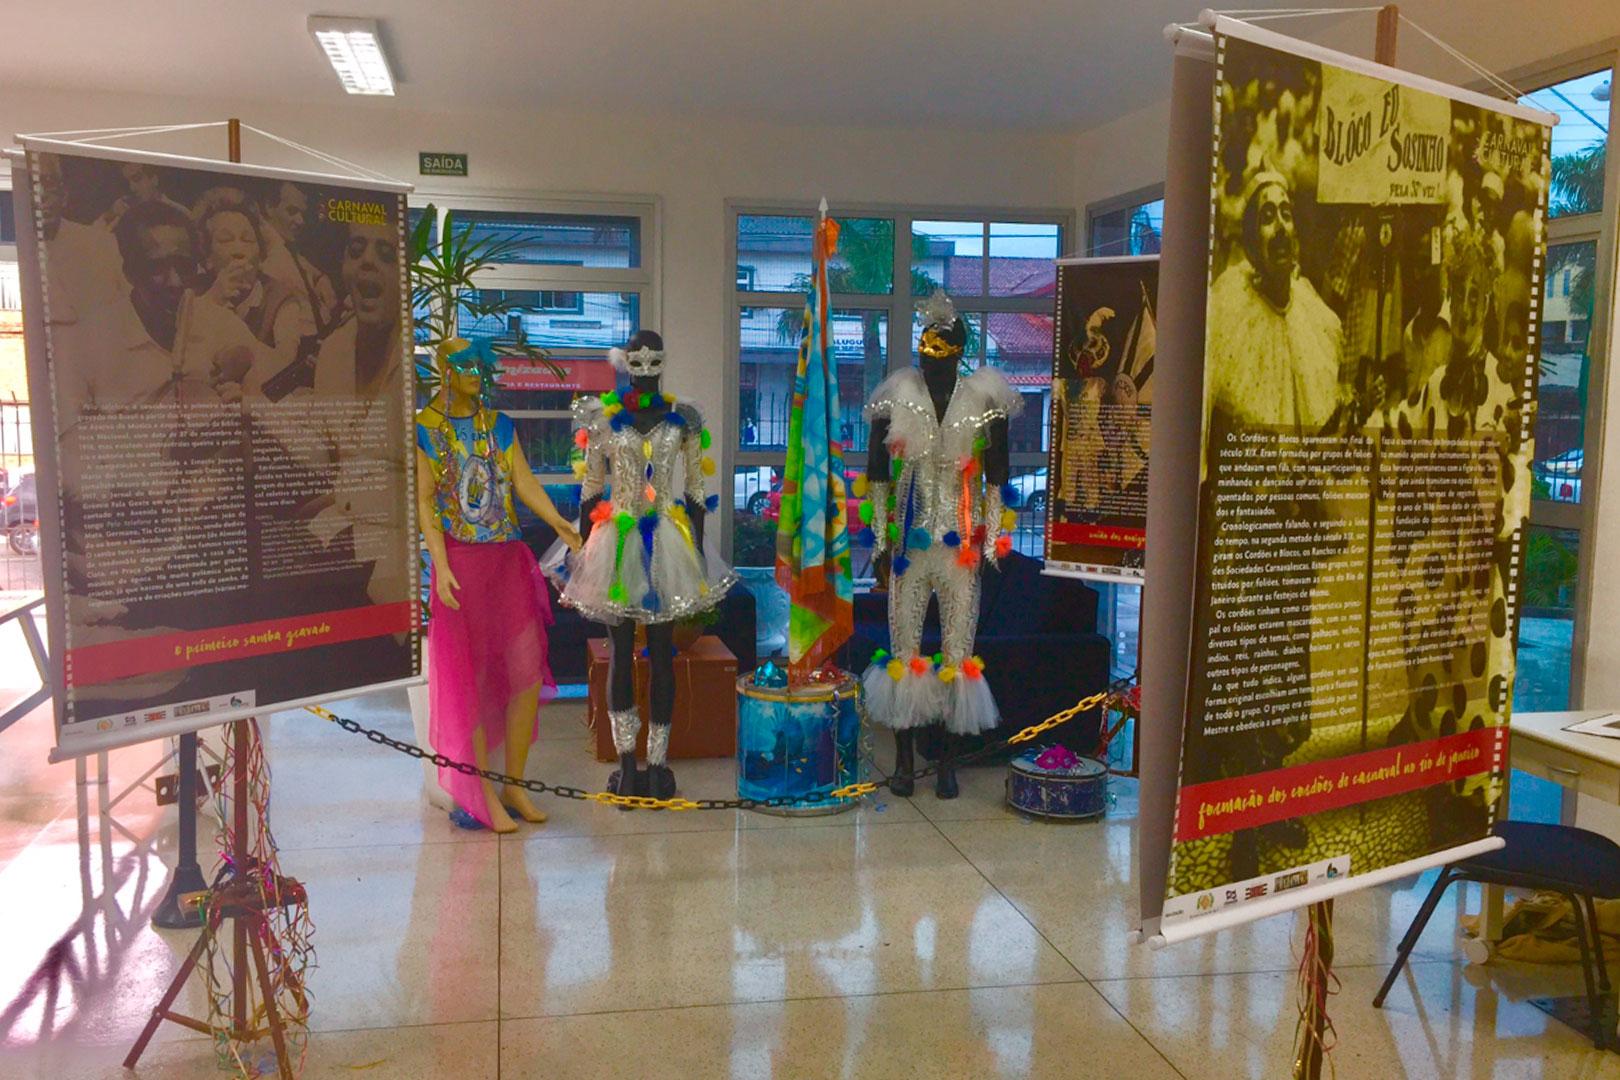 Fóruns promovem exposições culturais